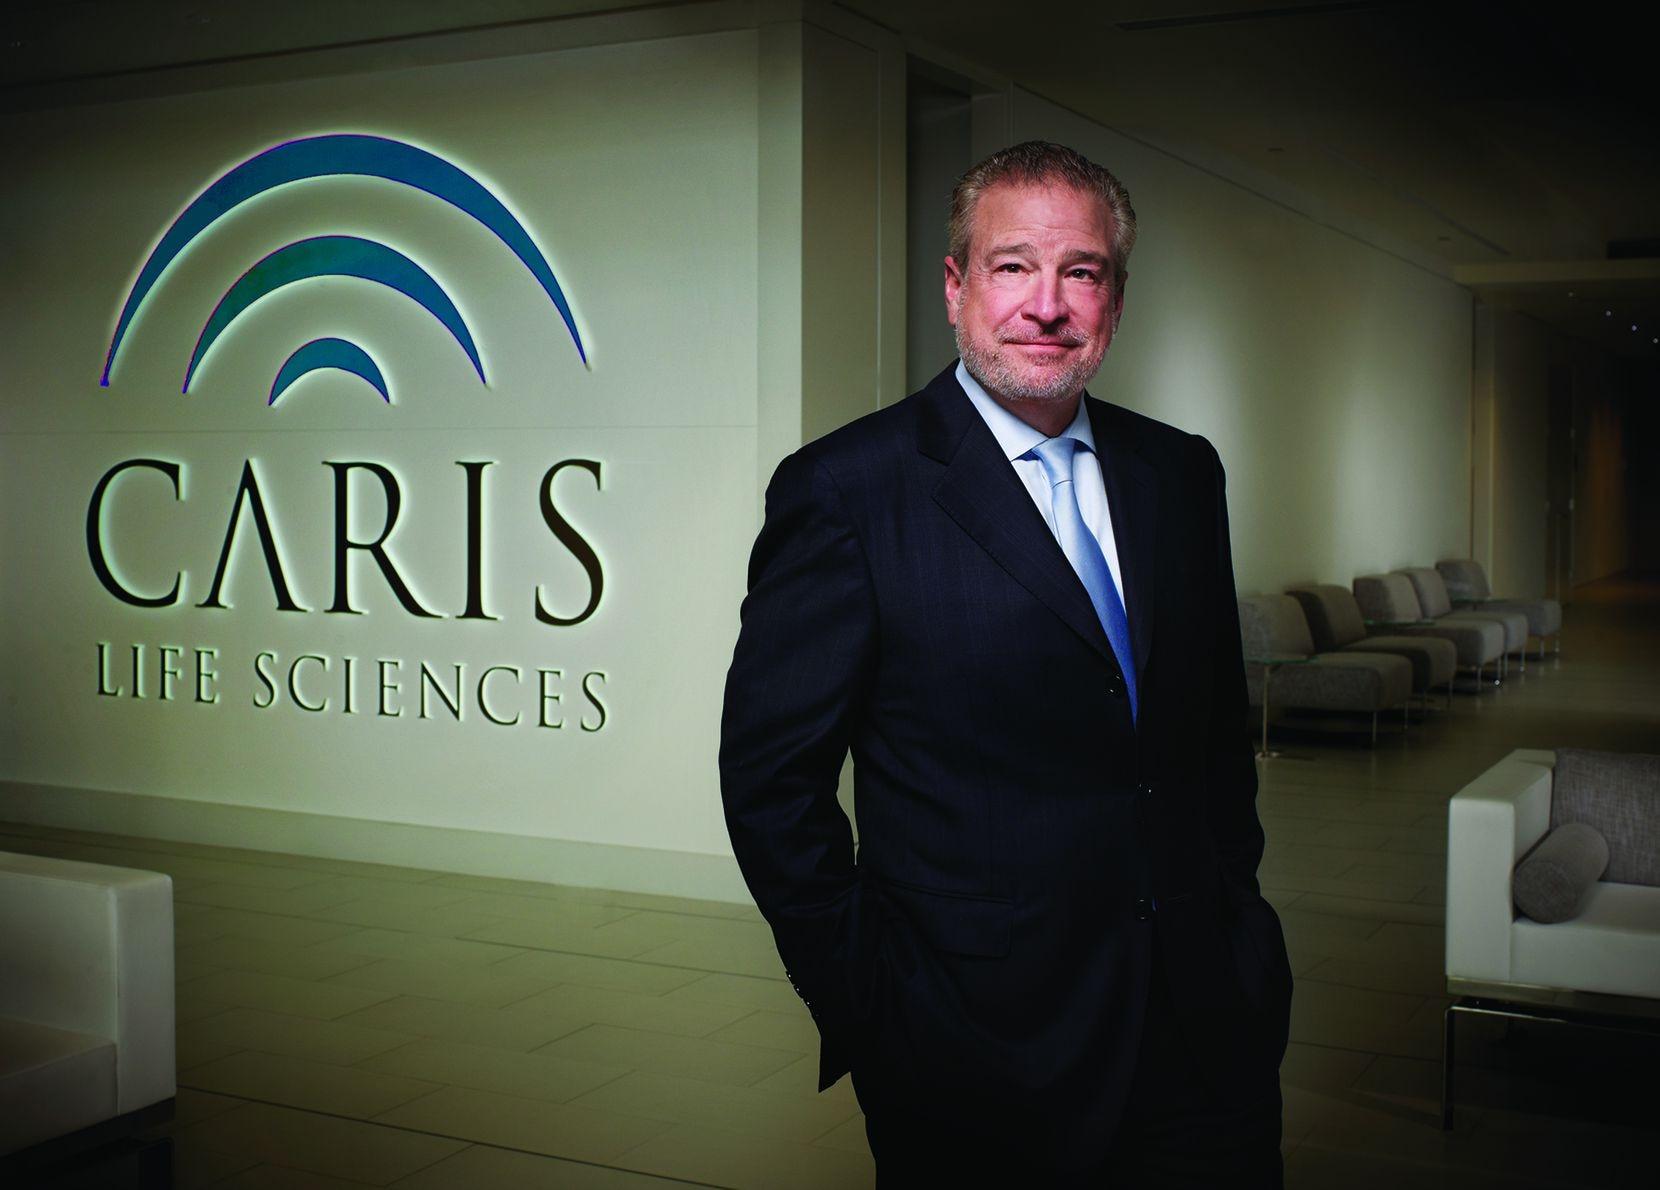 David D. Halbert, founder and chairman of Caris Life Sciences.